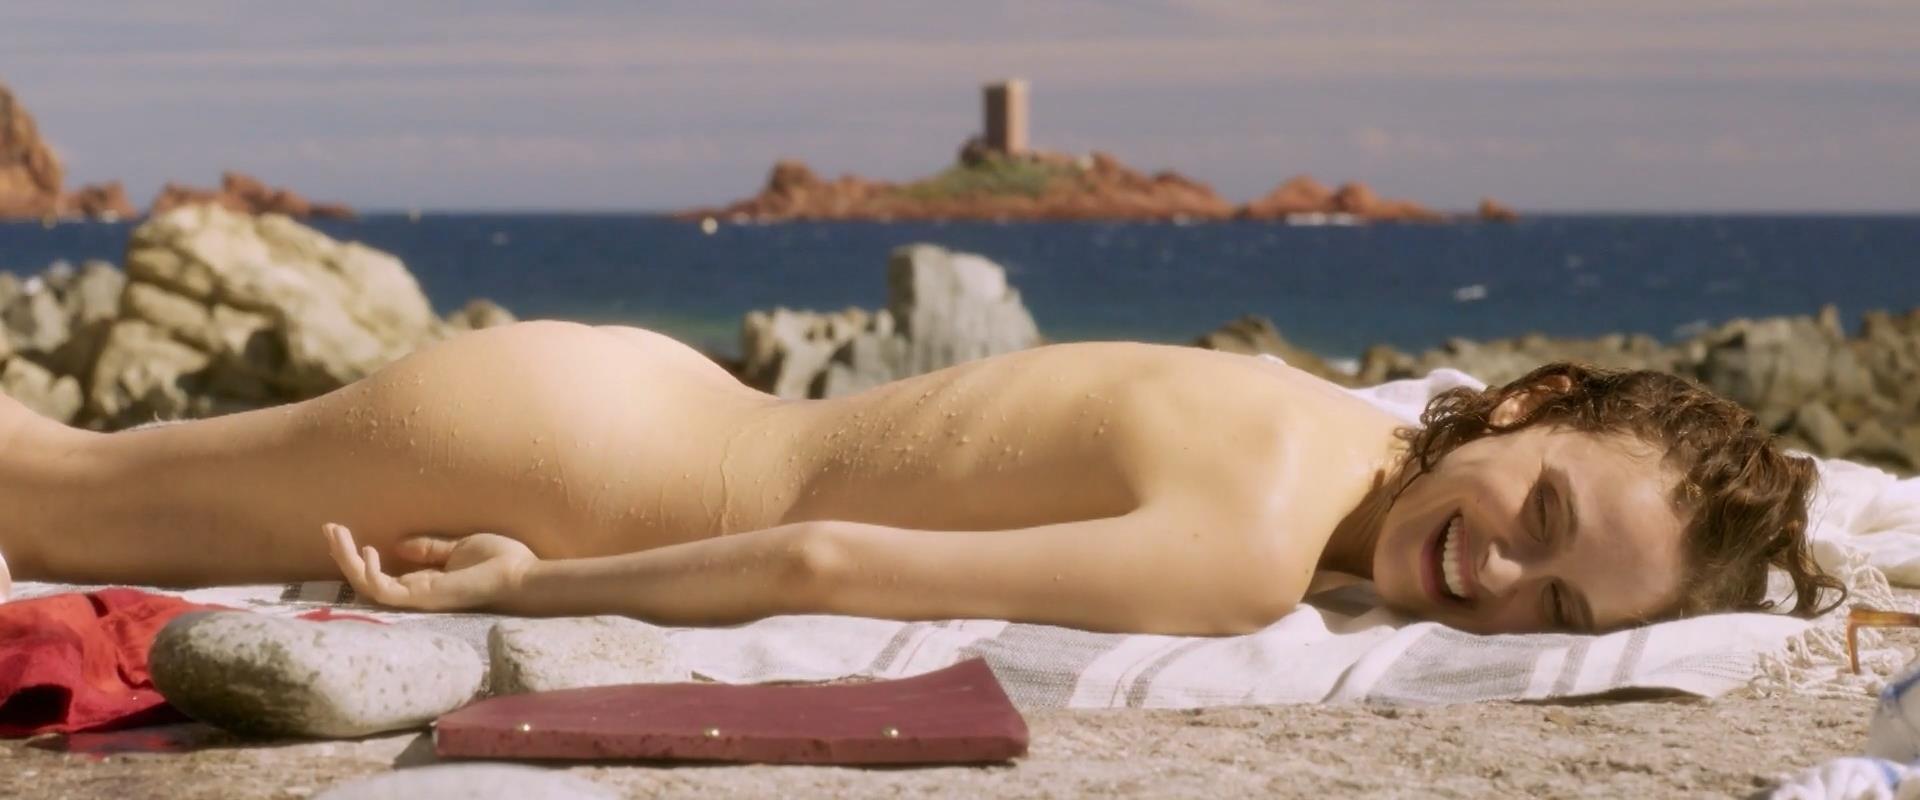 Stars Portman Naked Video Png